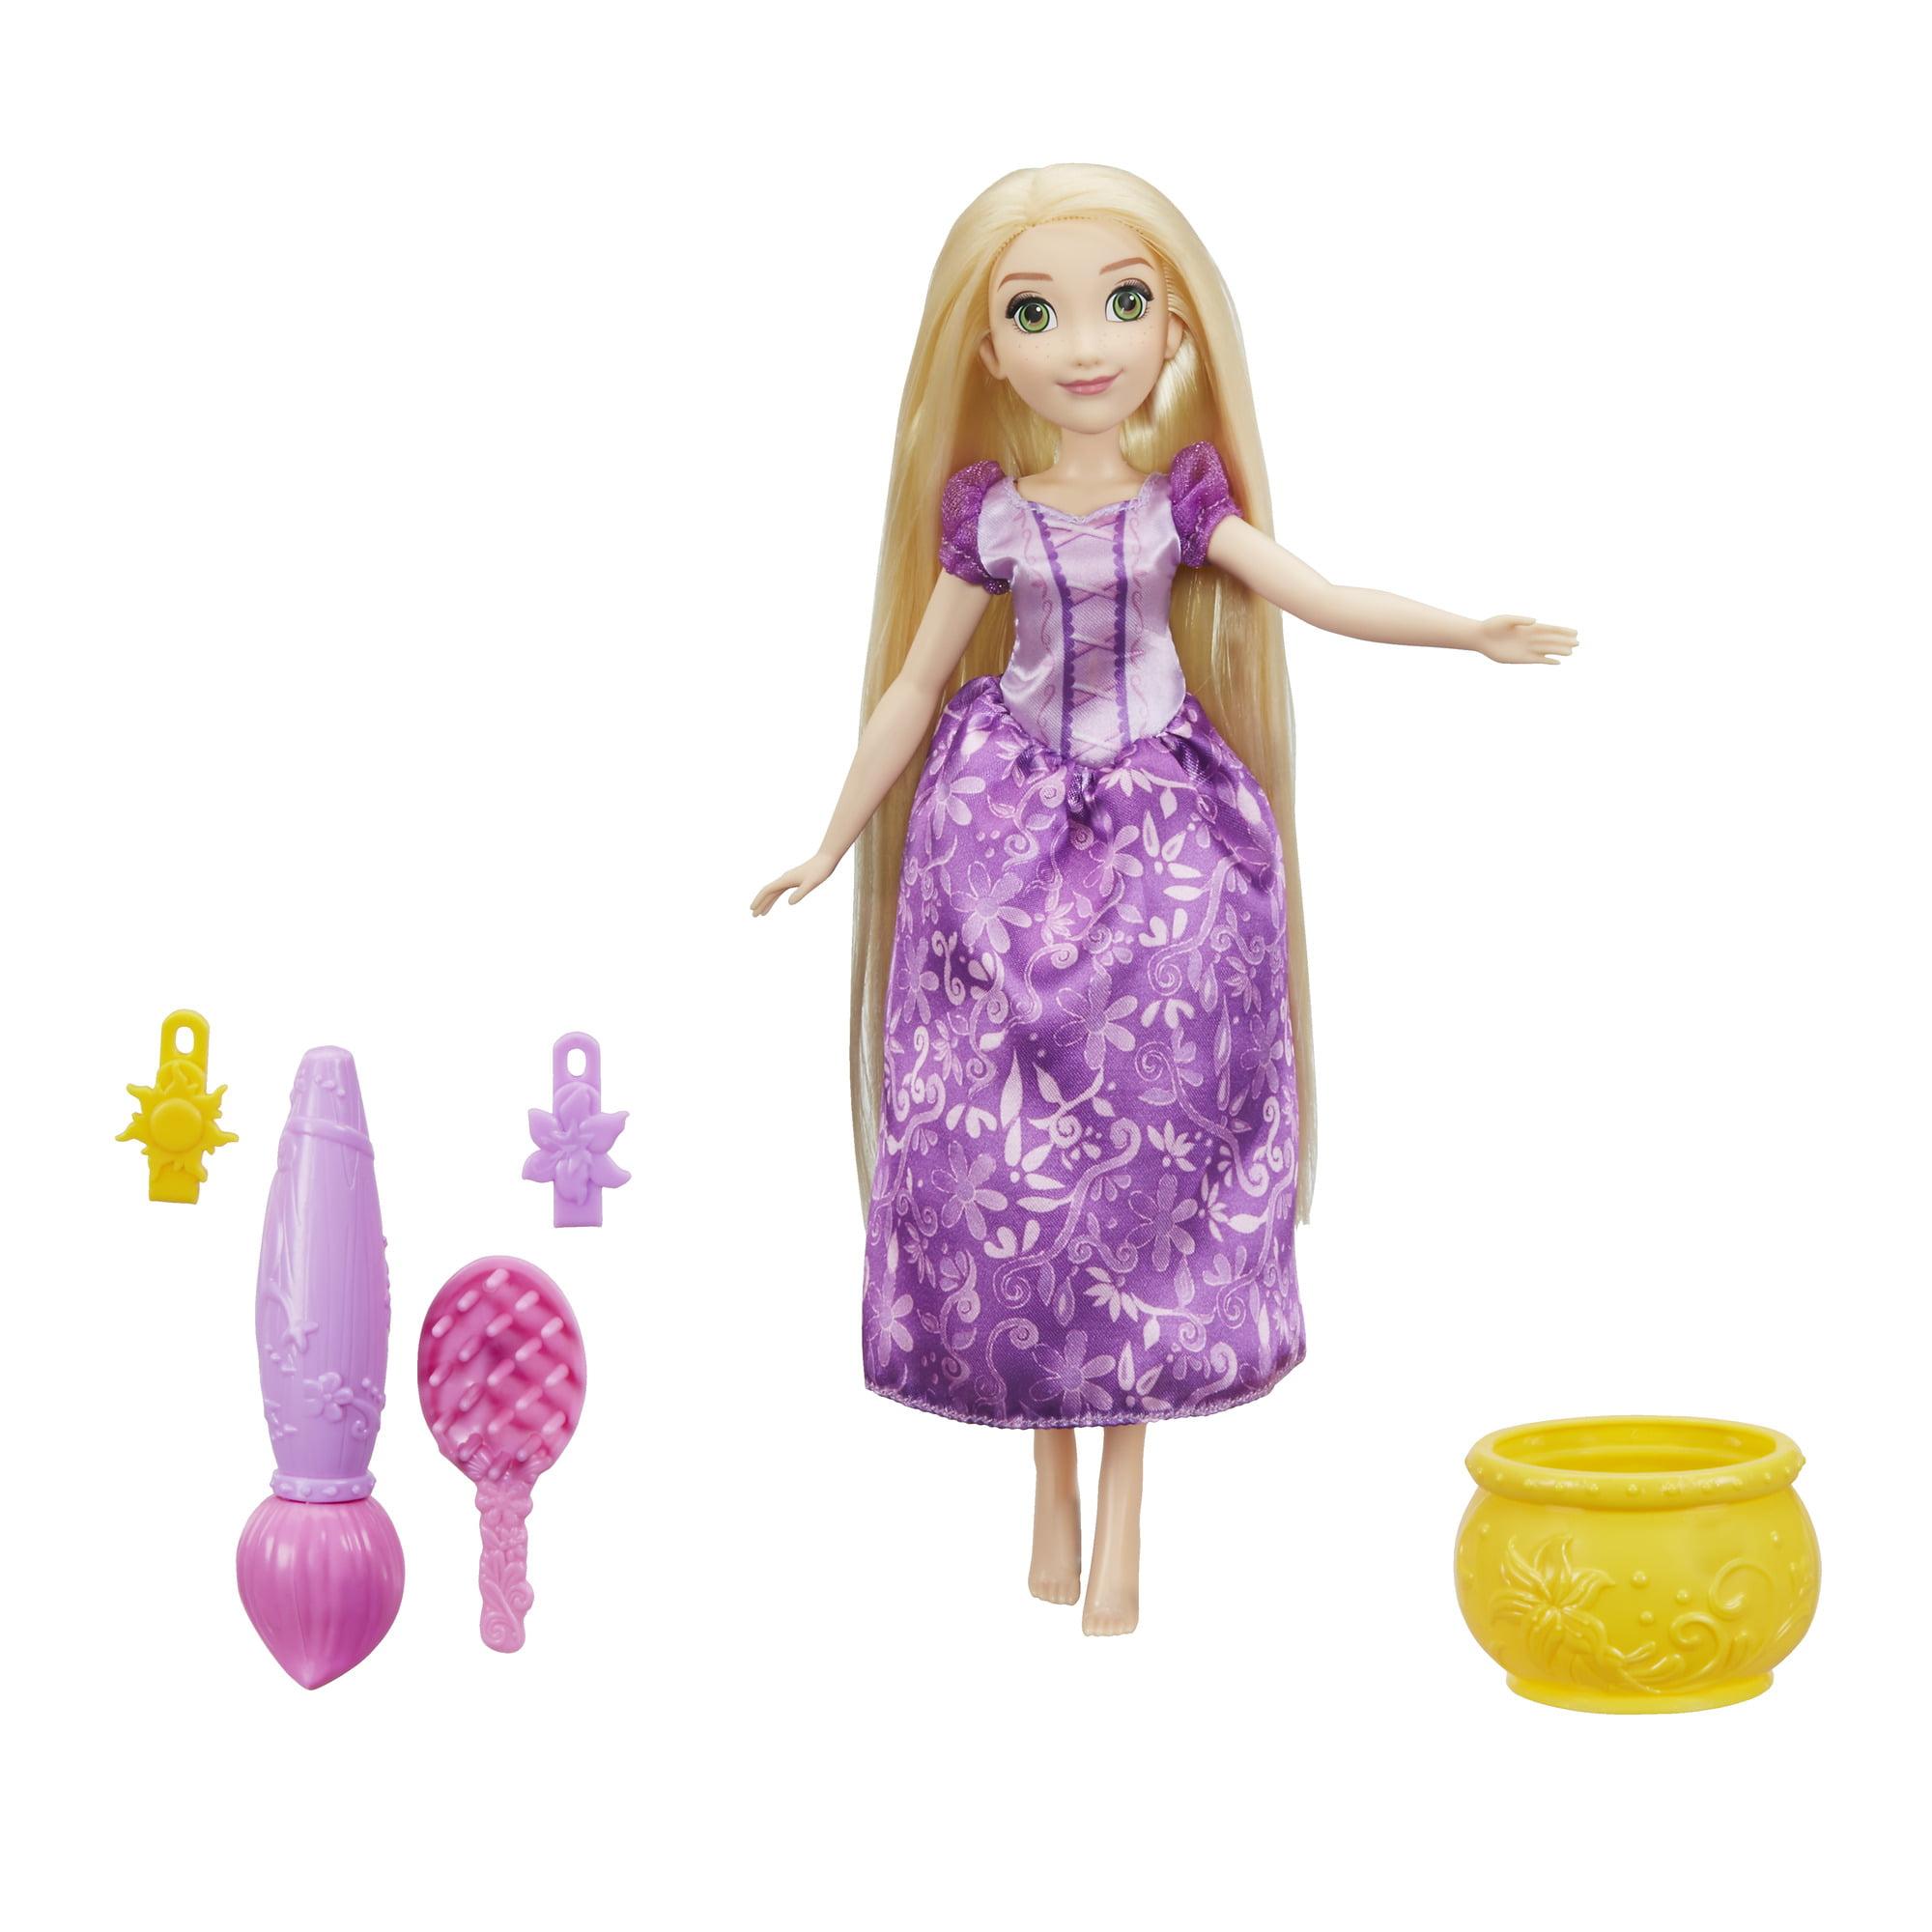 Disney Princess Rapunzel Stamp and Style